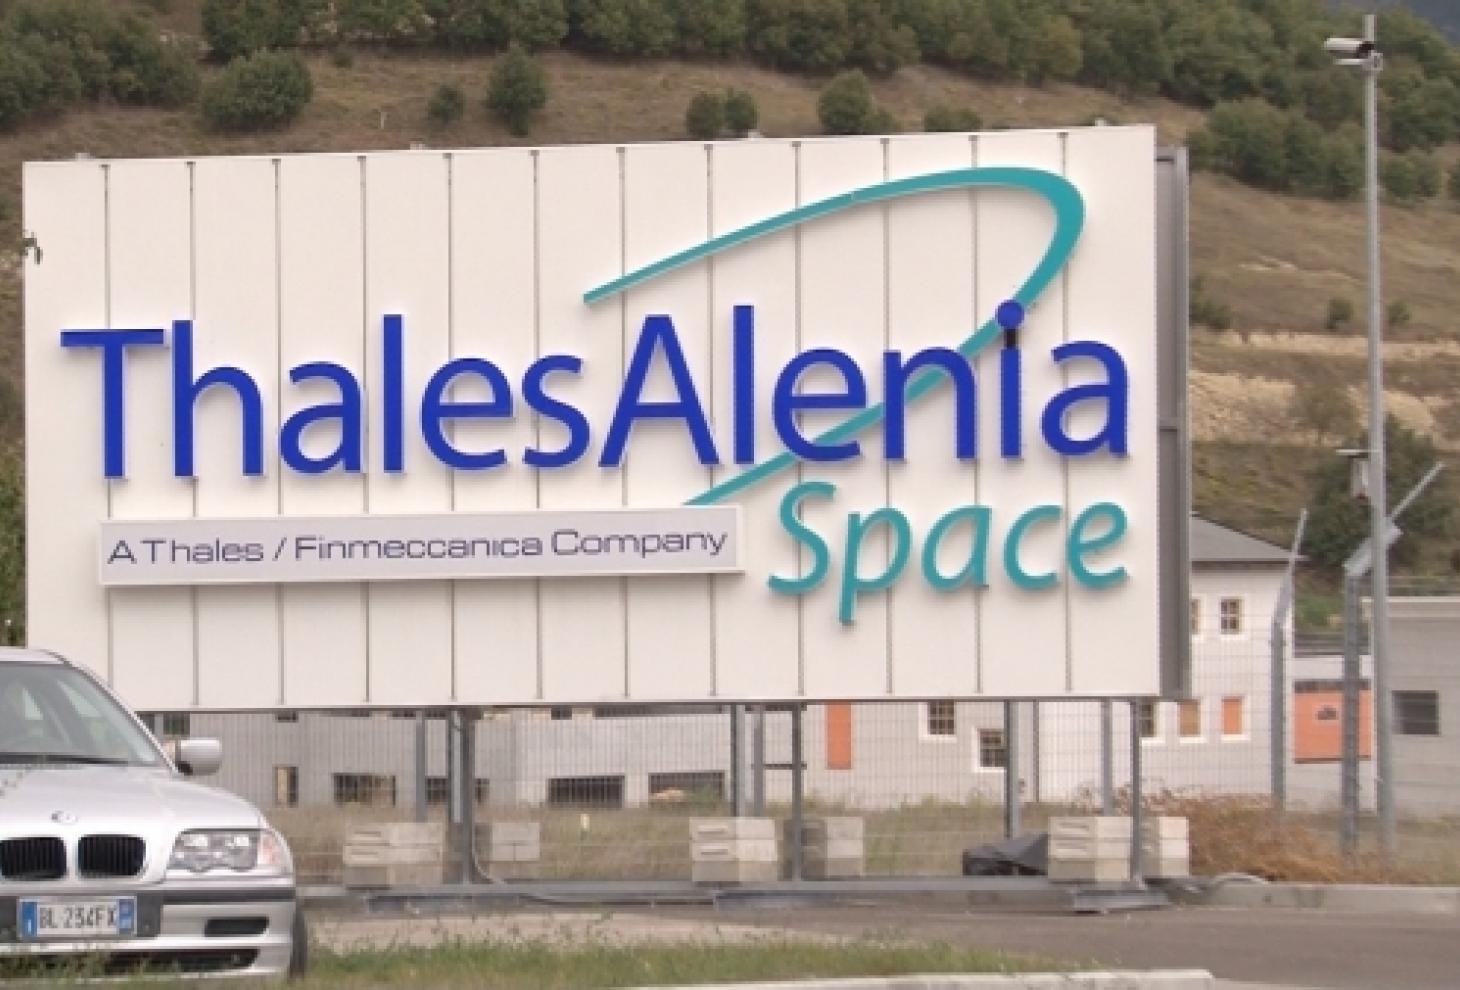 Thales Alenia Space